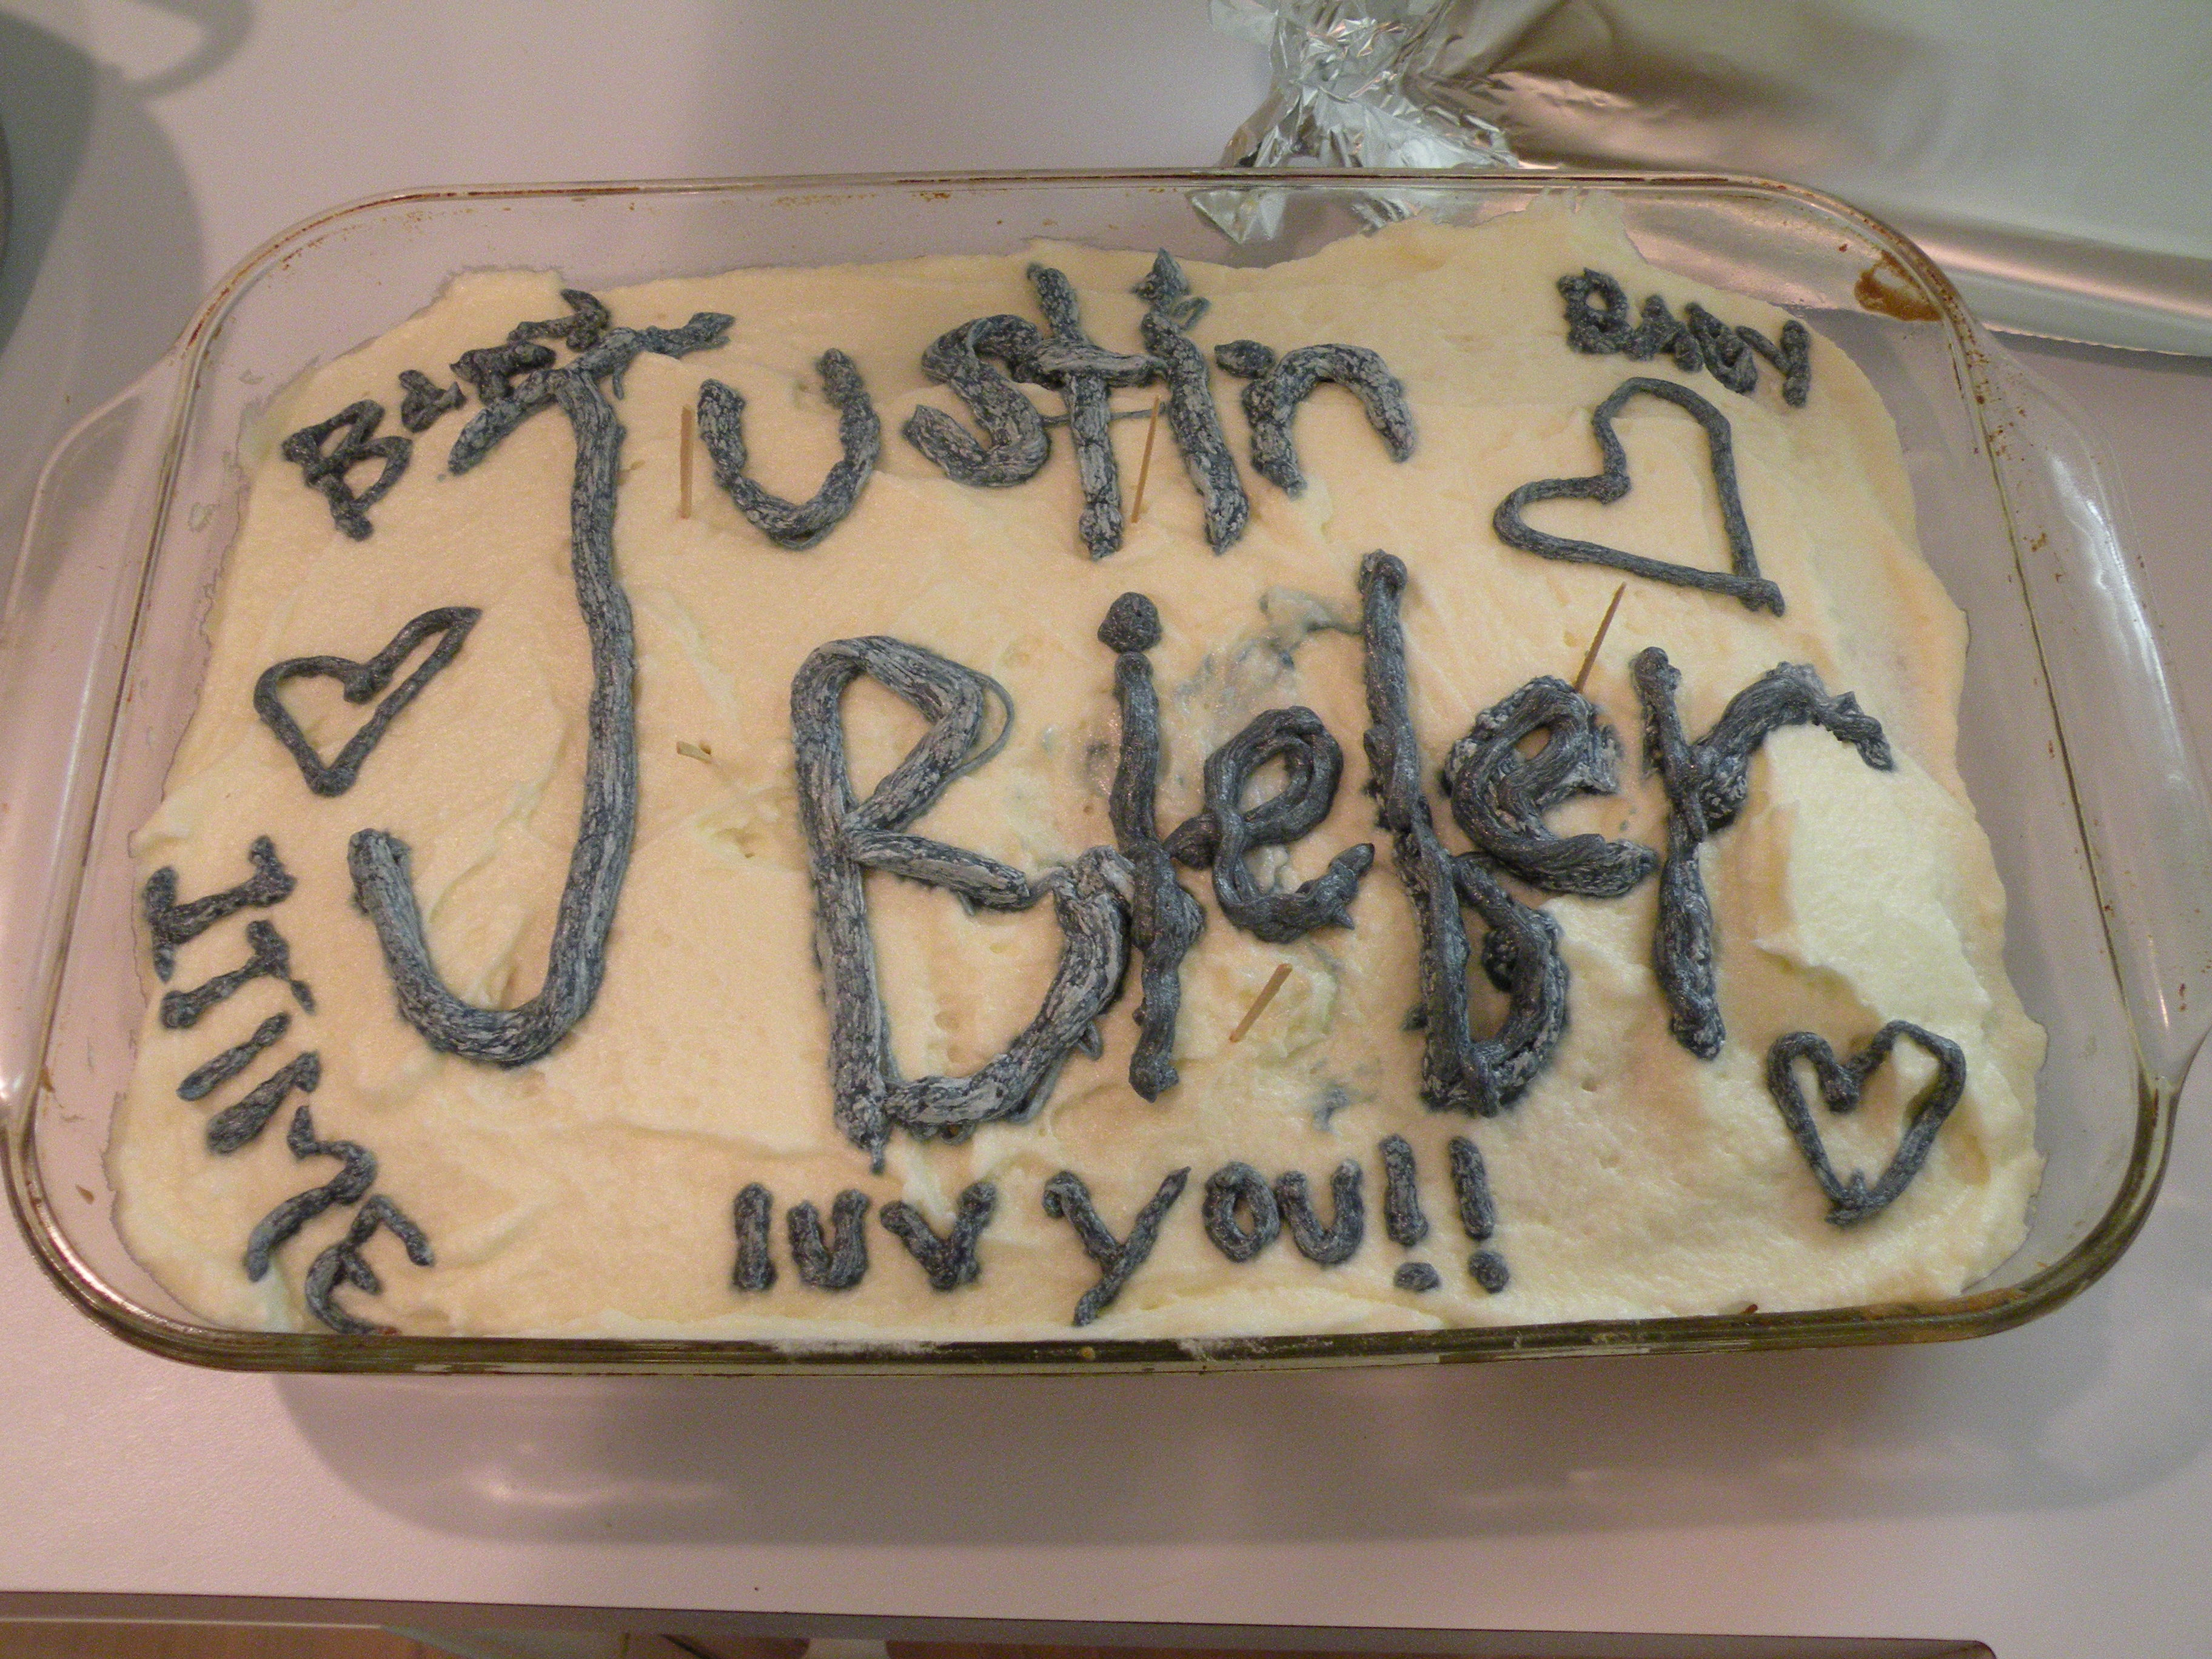 Tremendous Justin Bieber Birthday The Real Full House Funny Birthday Cards Online Elaedamsfinfo